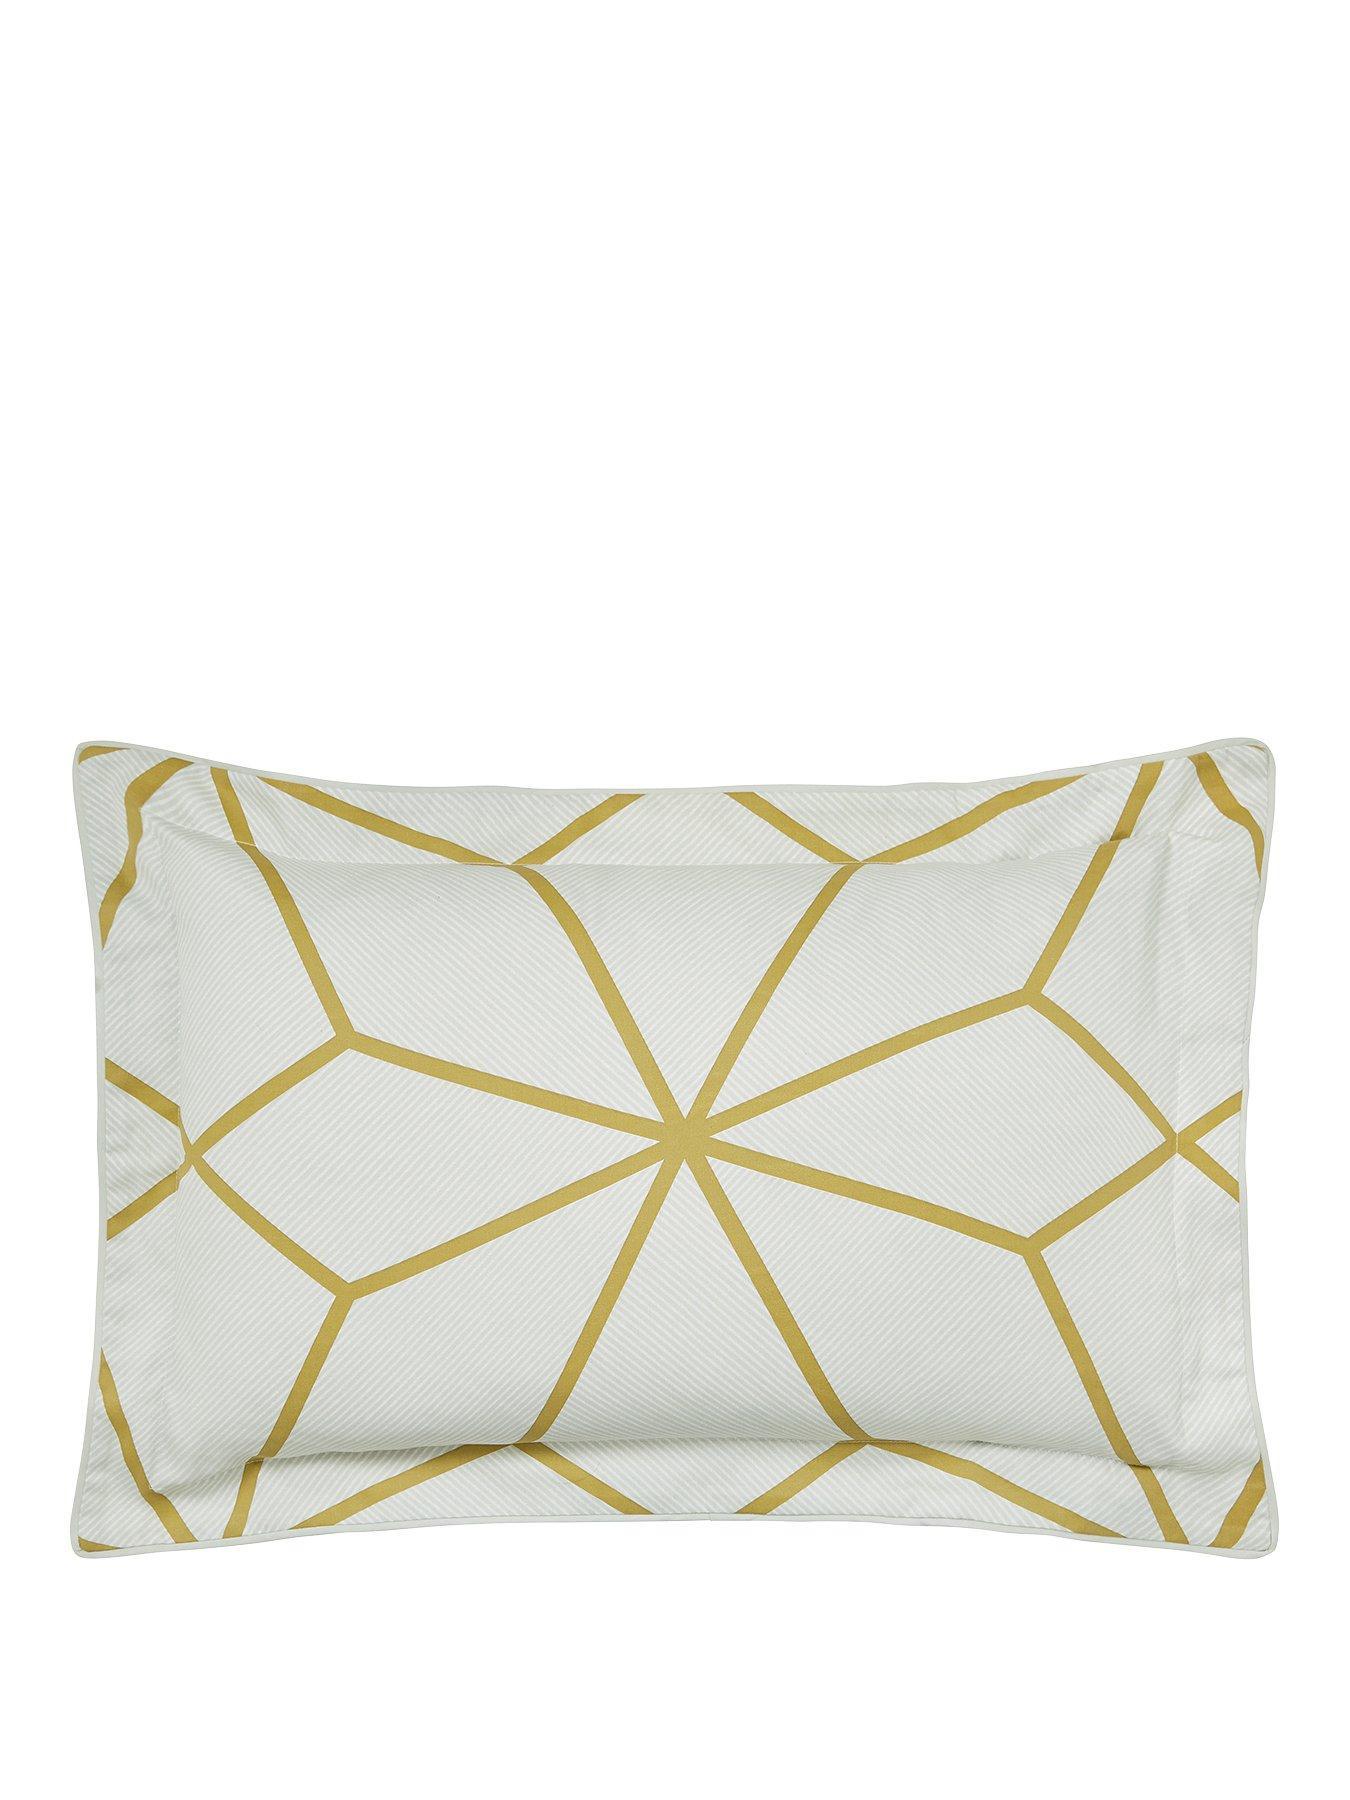 Harlequin Axal Oxford Pillowcase